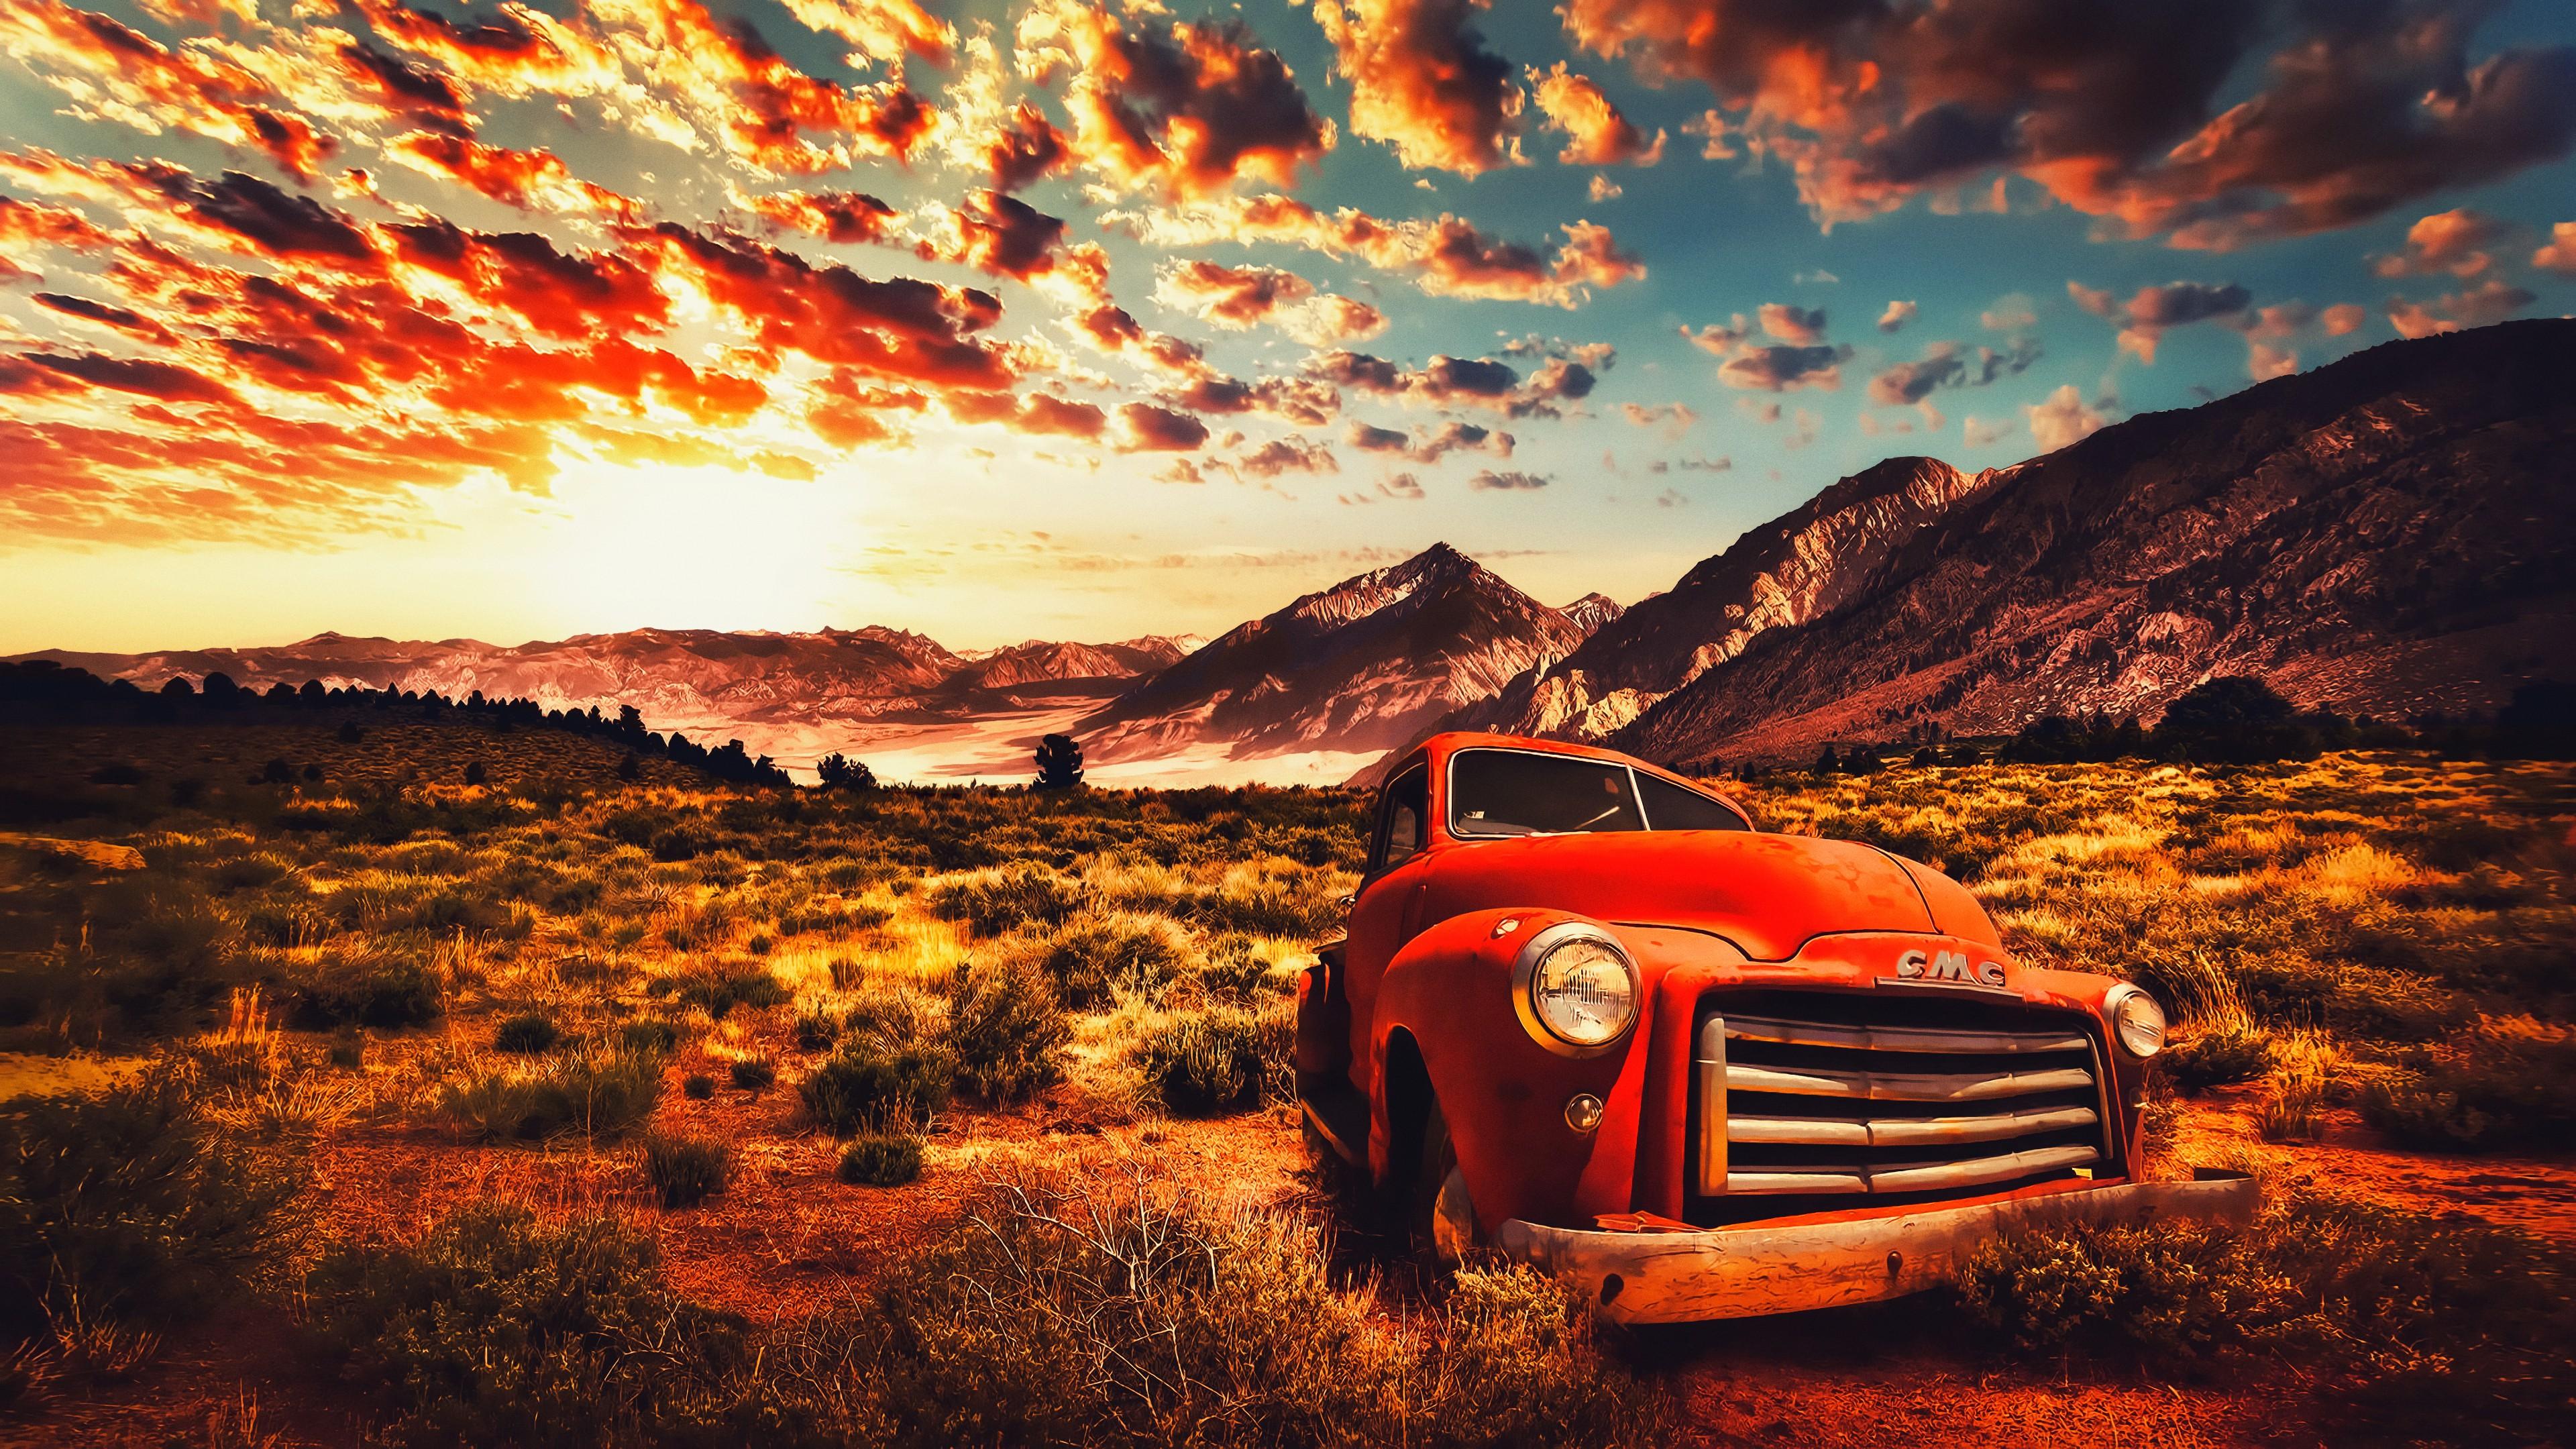 Fall Thanksgiving Desktop Wallpaper デスクトップ壁紙 日光 風景 日没 空 道路 日の出 イブニング 朝 砂漠 カリフォルニア